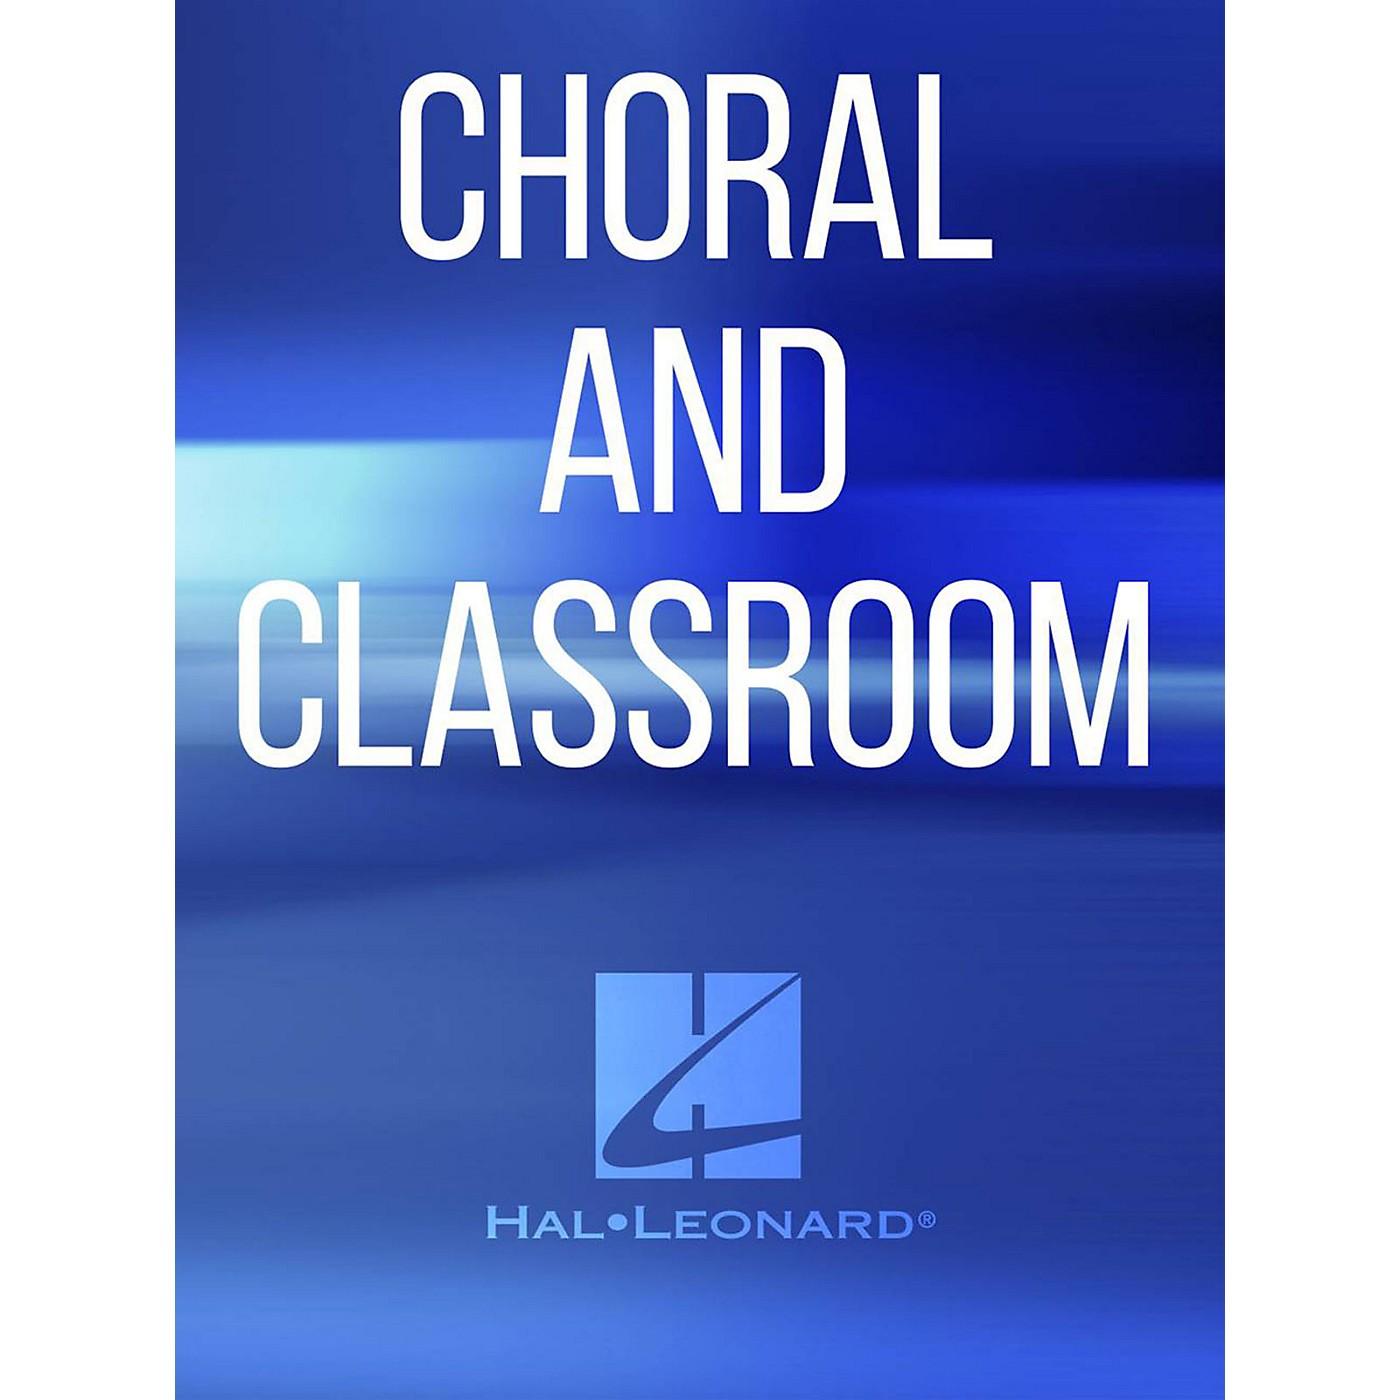 Hal Leonard A Dozen Duets for Everyone Everywhere #2 (Performance/Accompaniment CD) Arranged by Leonard Van Camp thumbnail